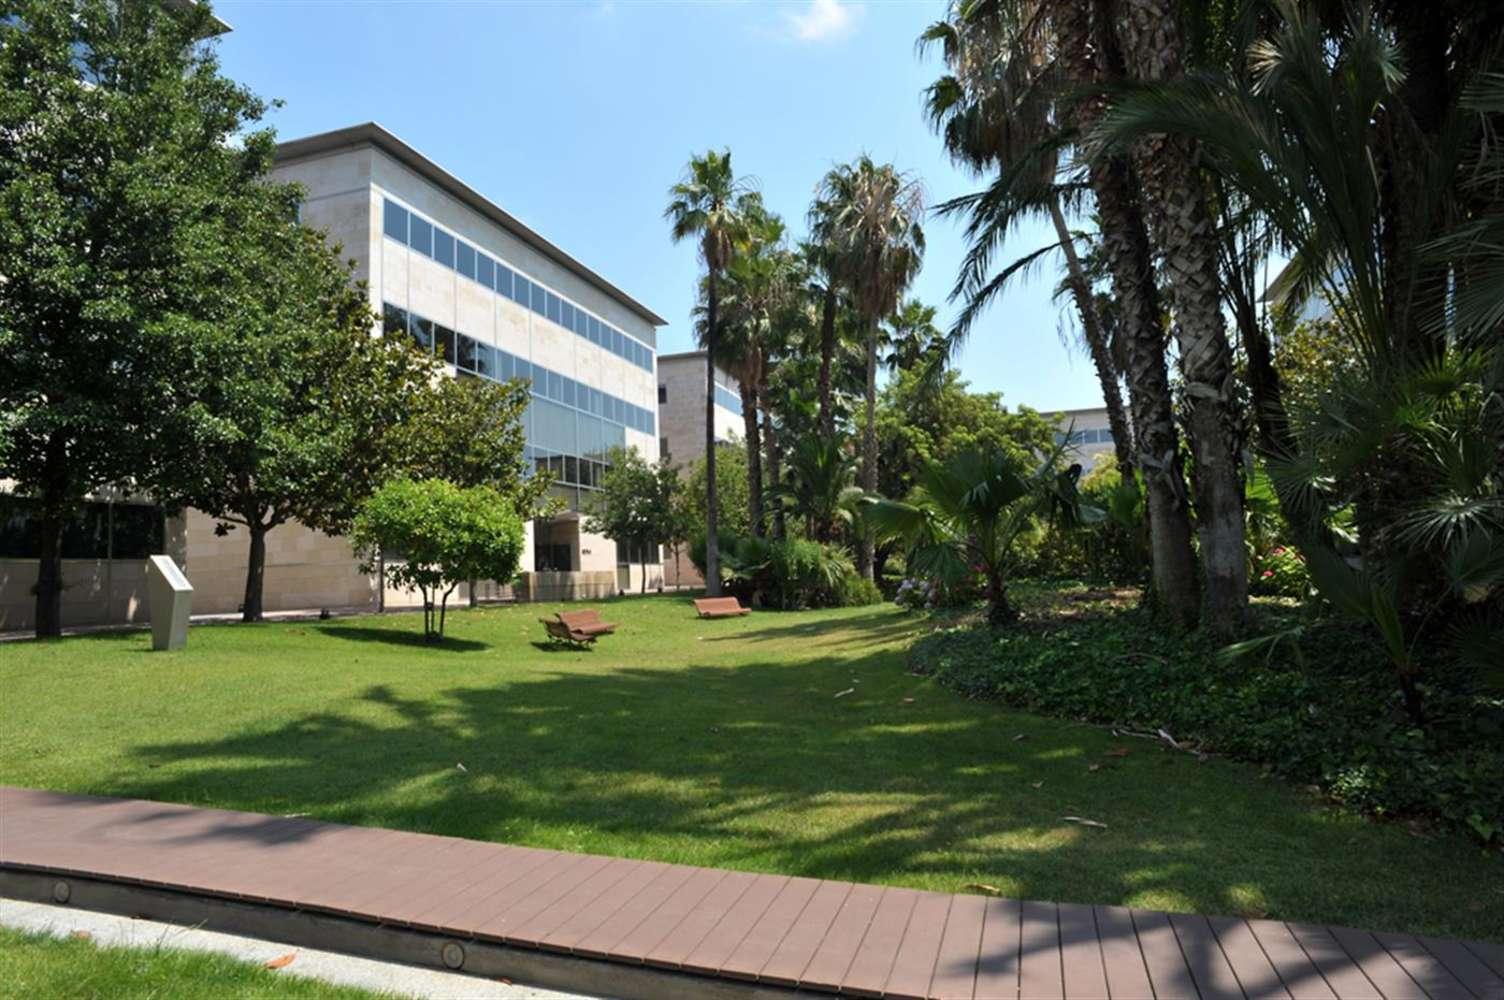 Oficina Cornellà de llobregat, 08940 - CITY PARC - EDIFICIO ATENAS - 11777